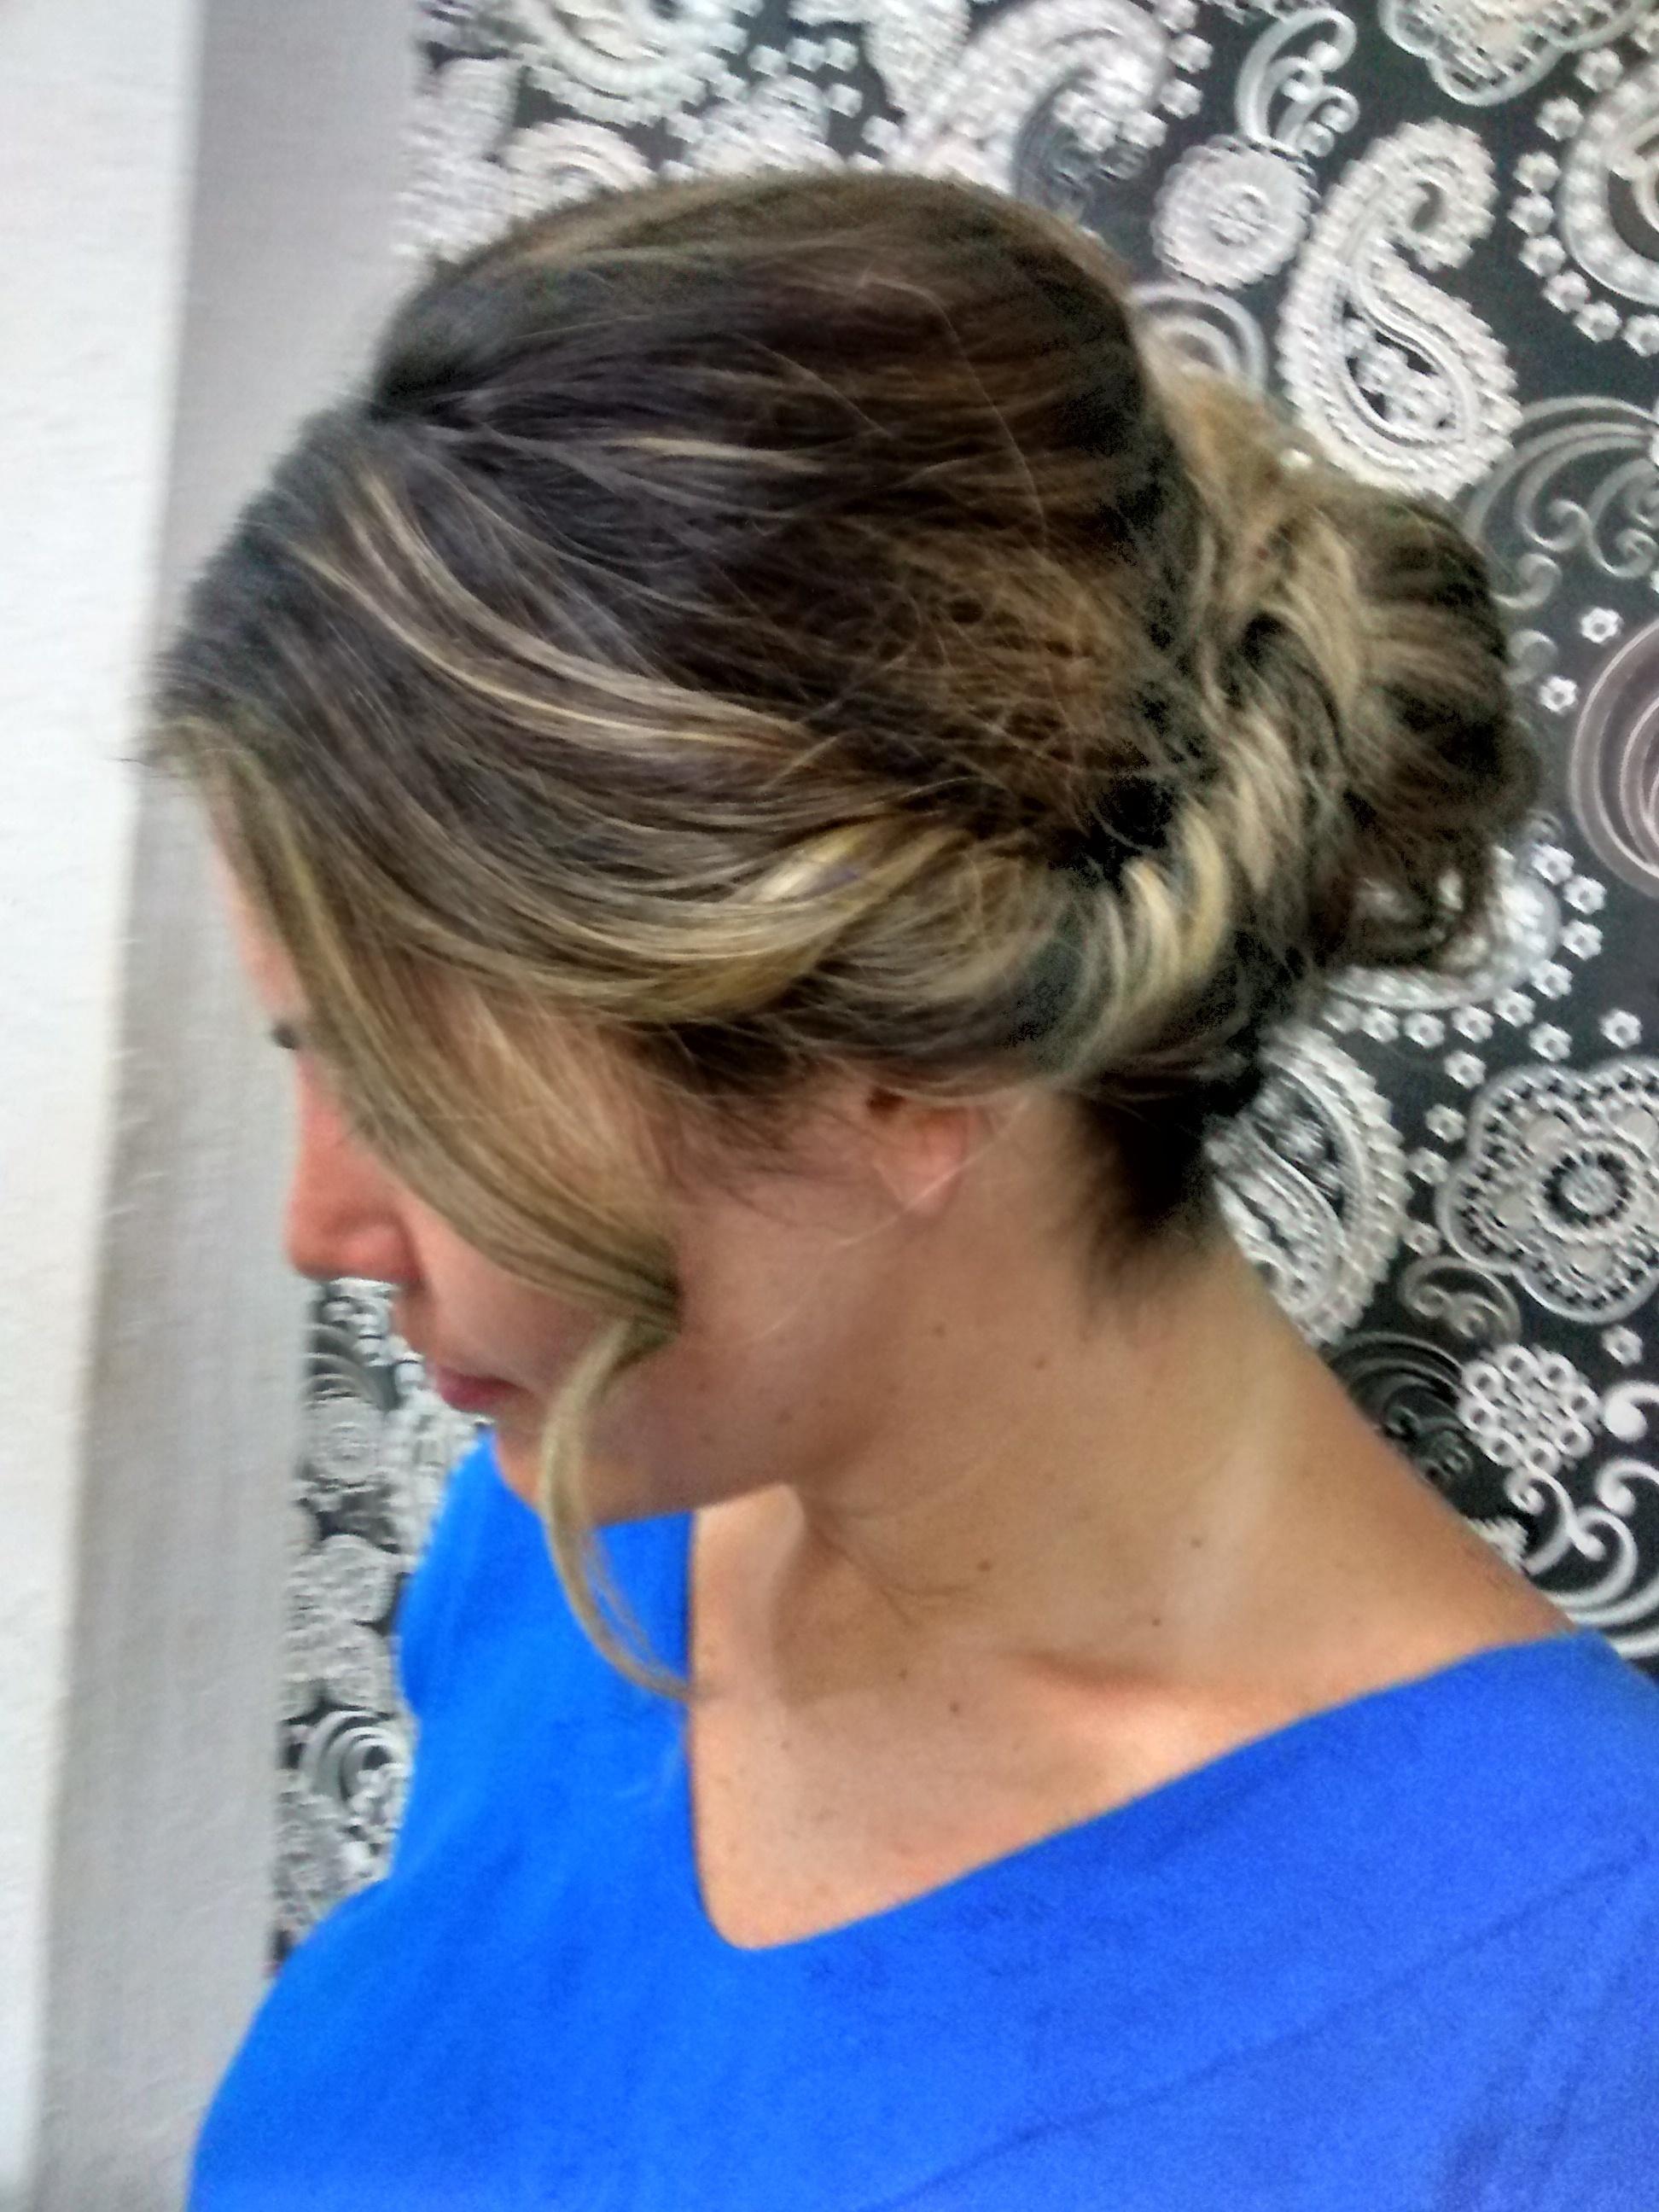 penteado semi preso, cabelo